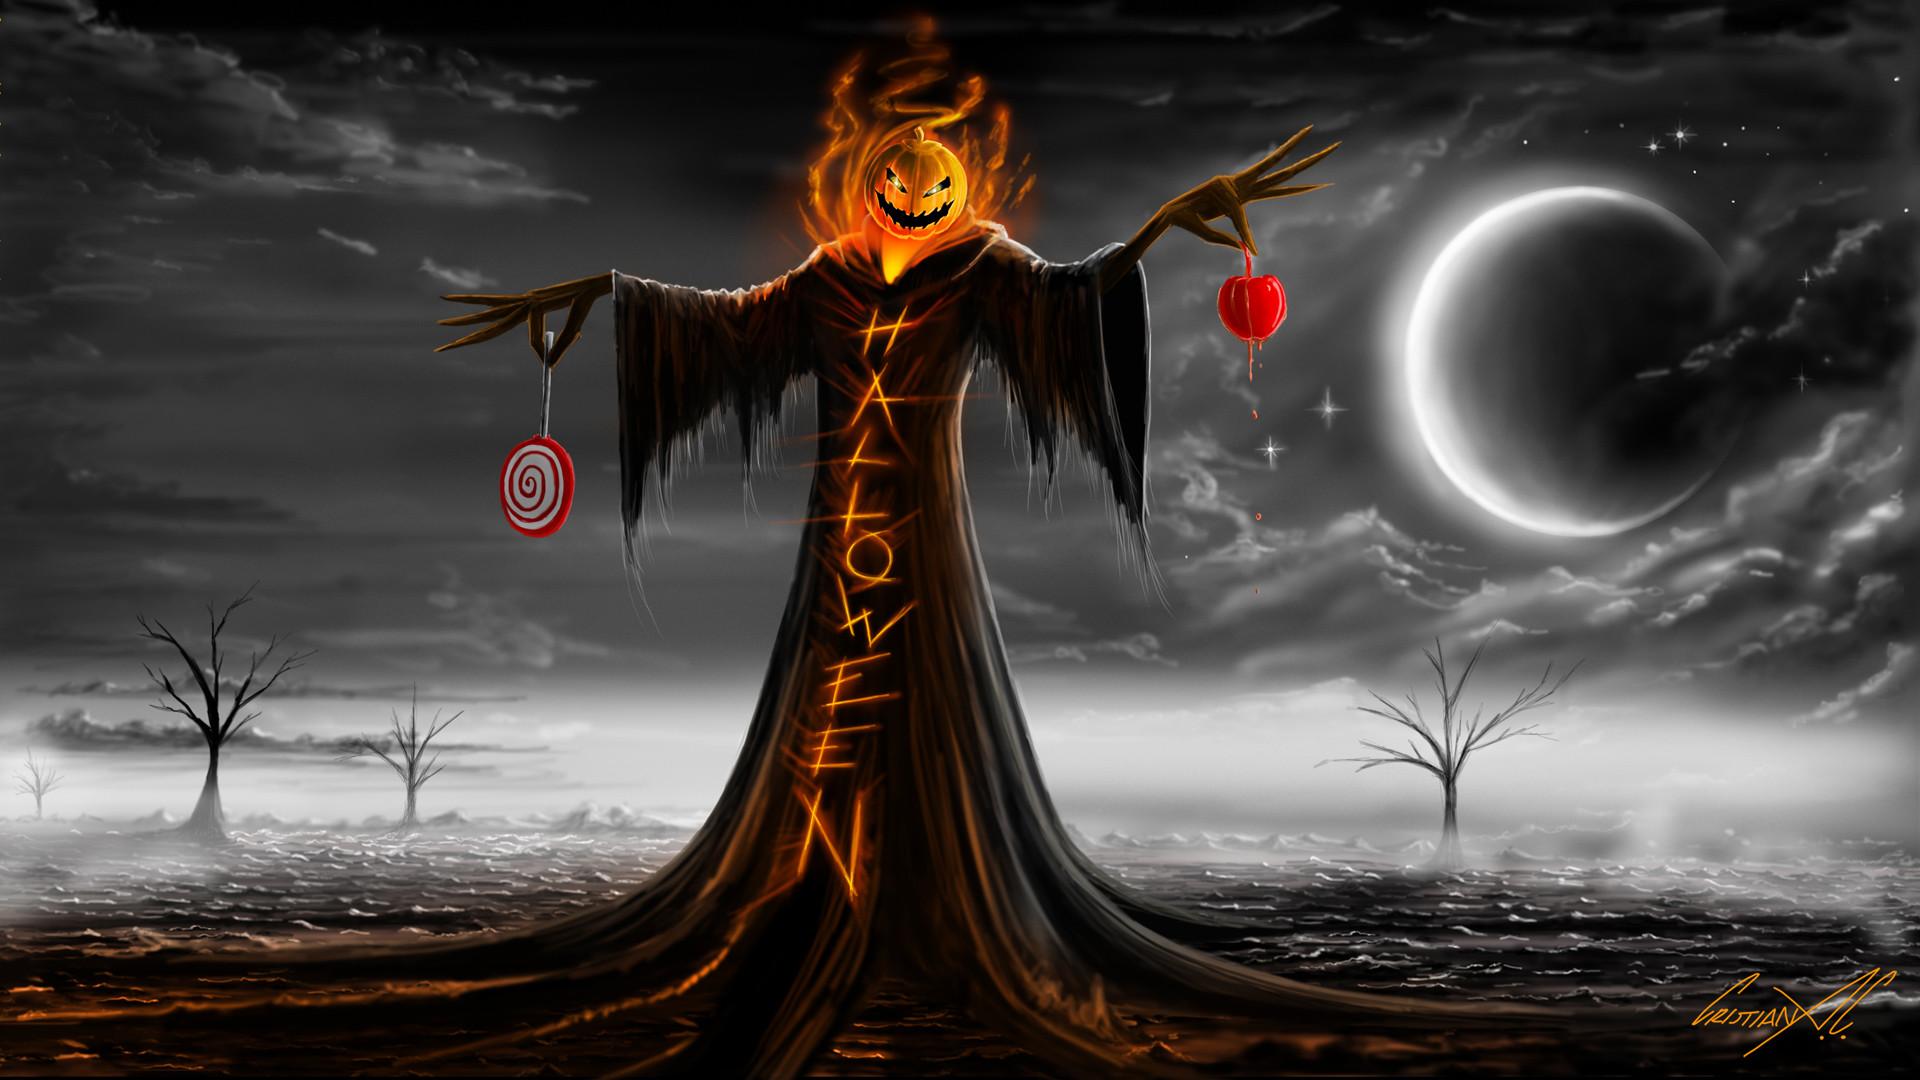 Halloween 1080p Wallpapers   Full HD Wallpapers, download 1080p .